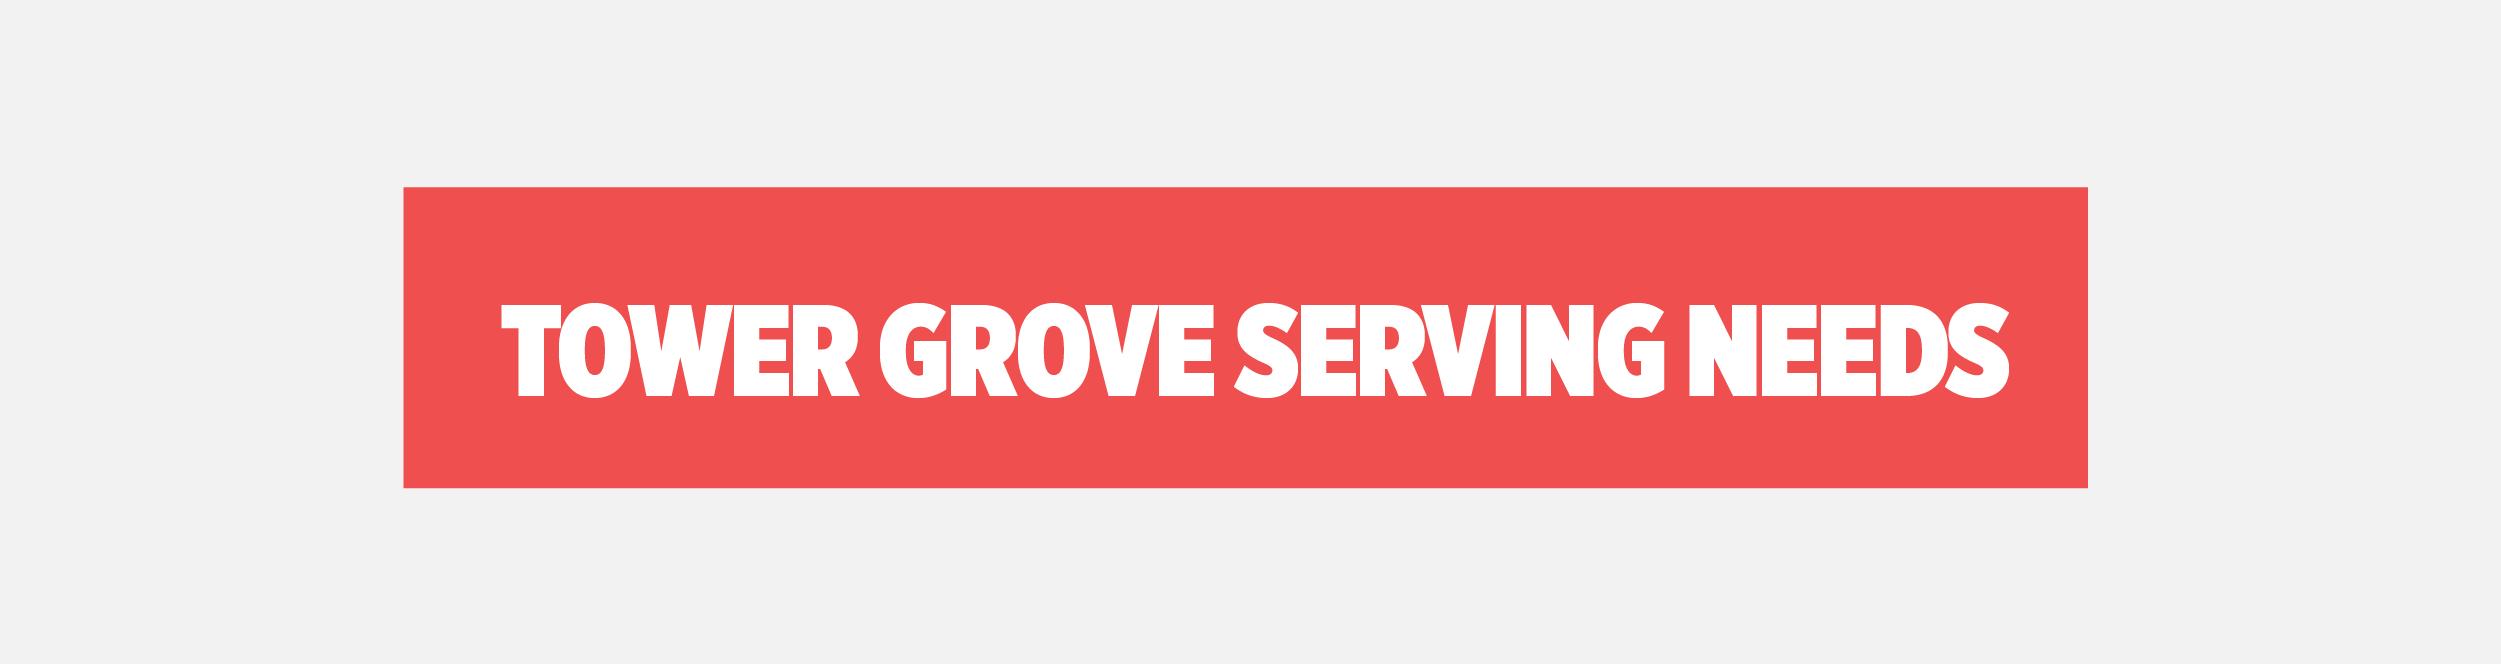 Serving needs